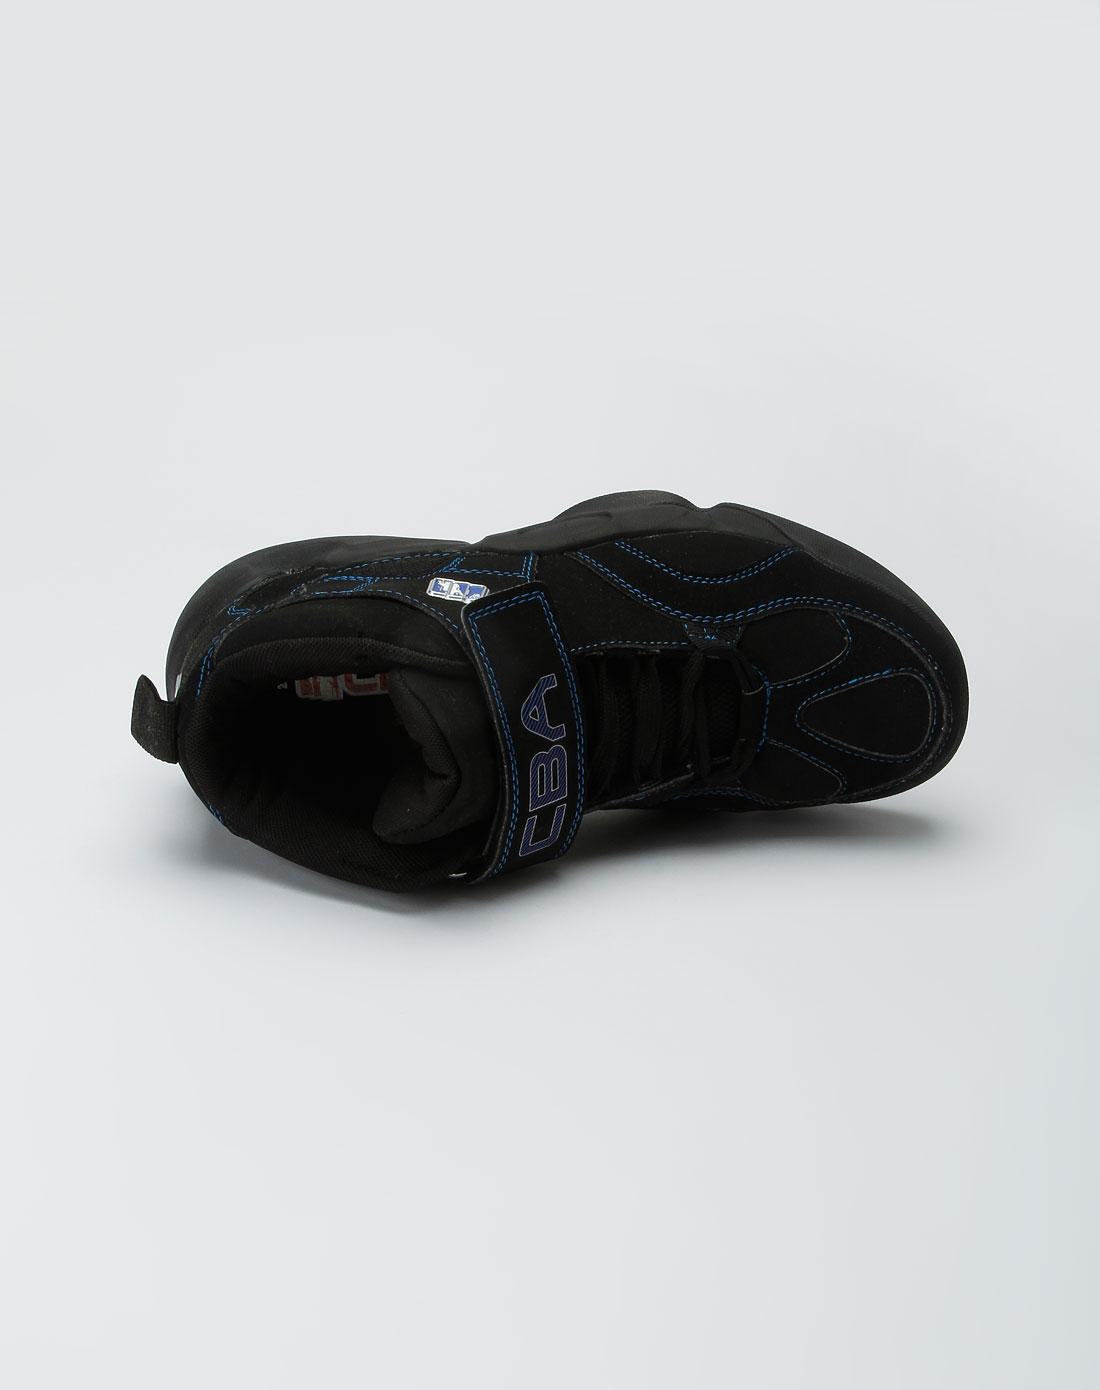 cba男款黑色魔术贴时尚篮球鞋